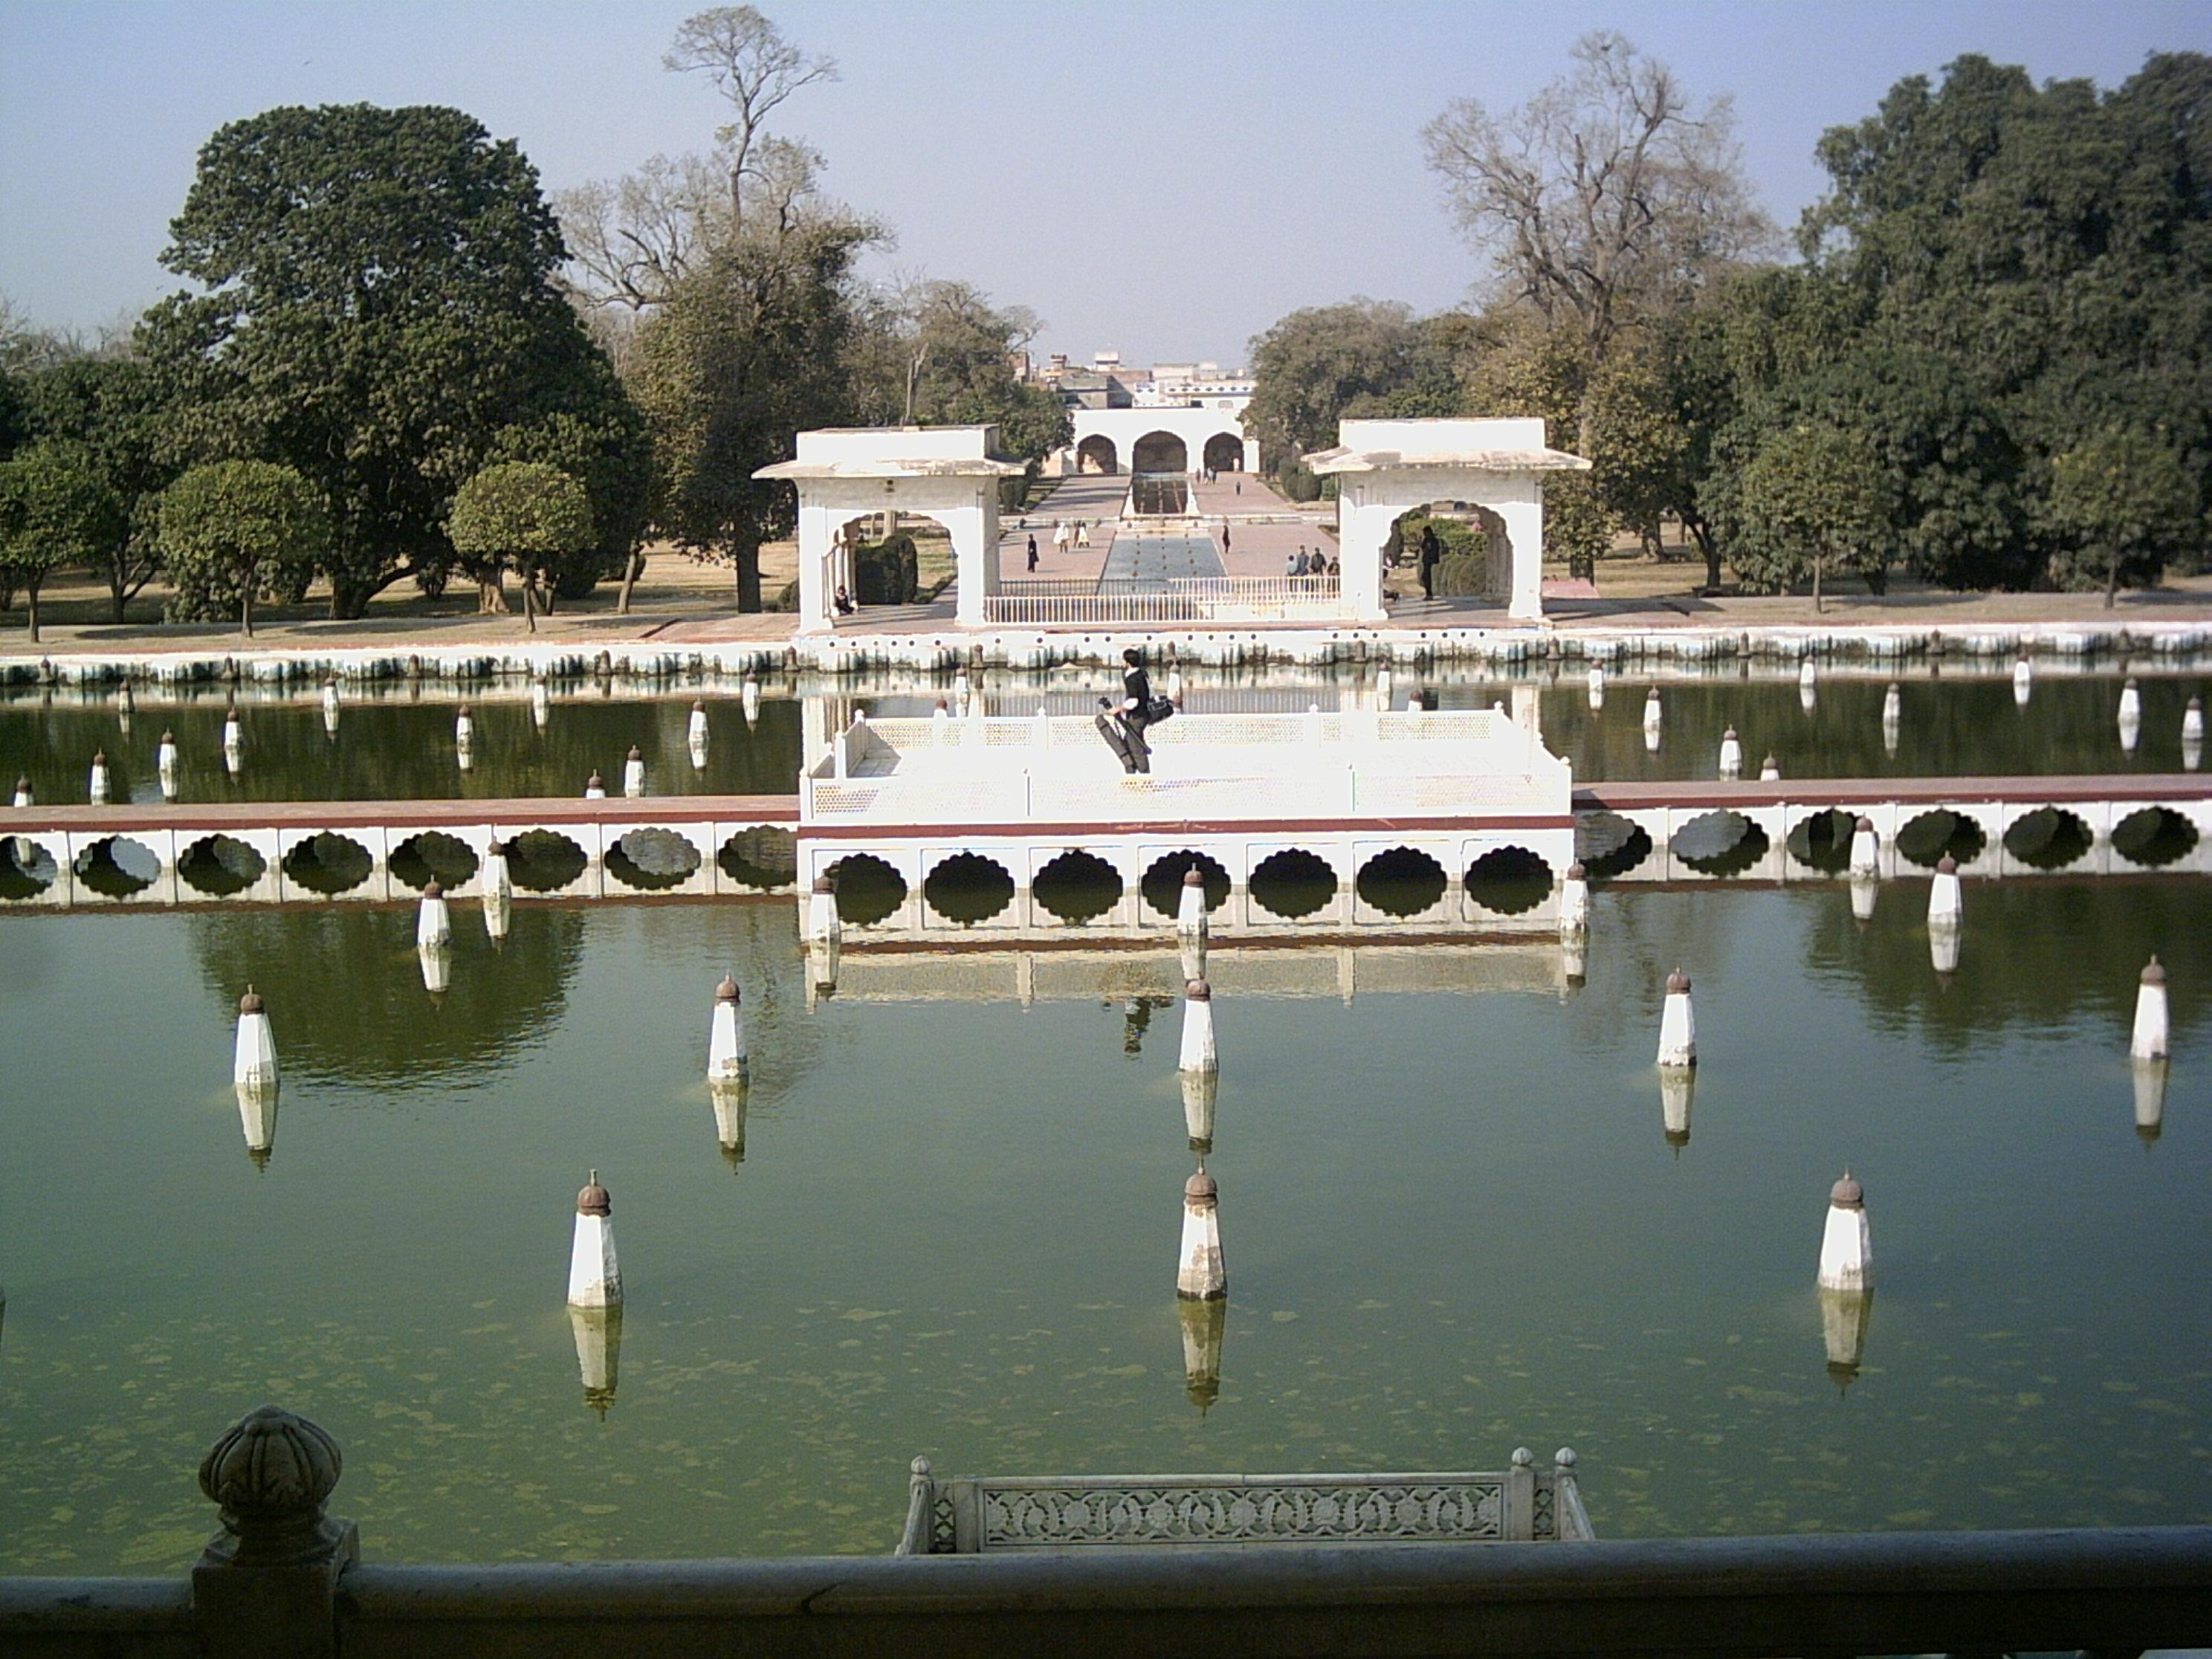 Shalimar Gardens, Lahore built by the Mughal emperor Aurangzeb.